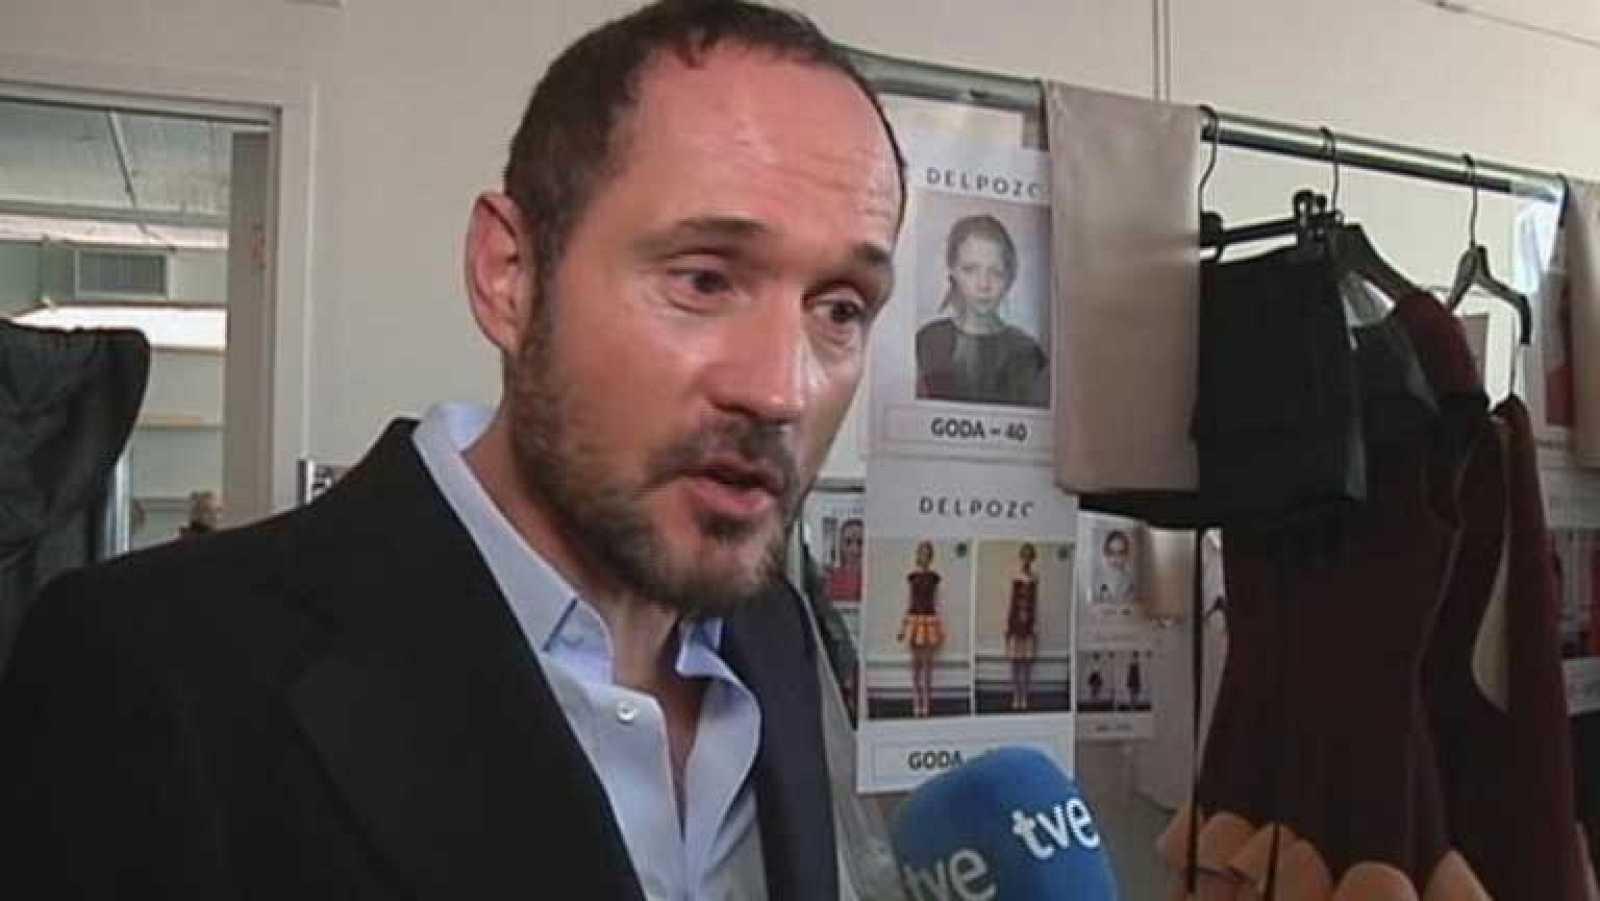 El diseñador Josep Font debuta en la meca de la moda